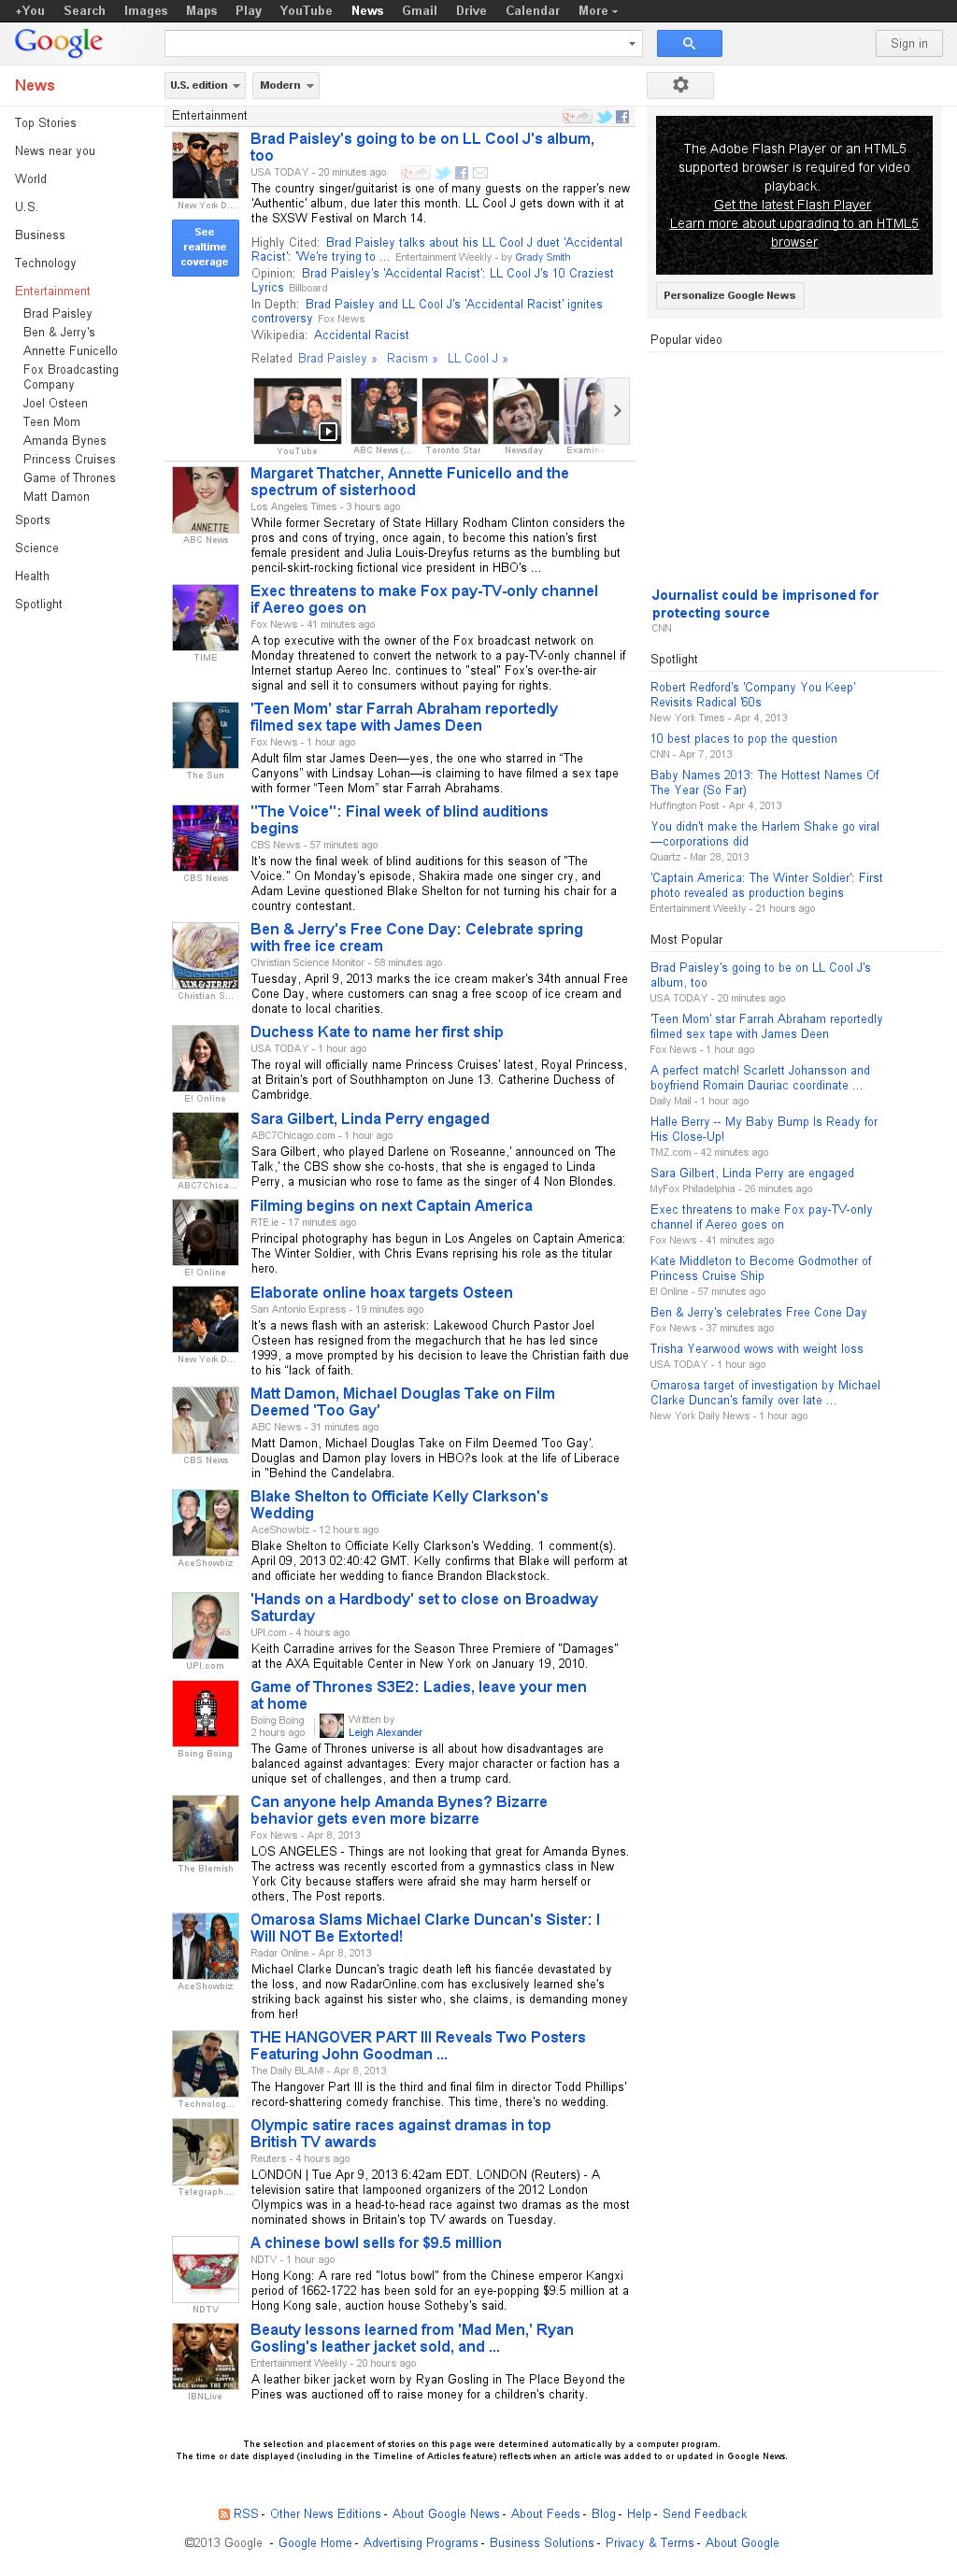 Google News: Entertainment at Tuesday April 9, 2013, 3:16 p.m. UTC